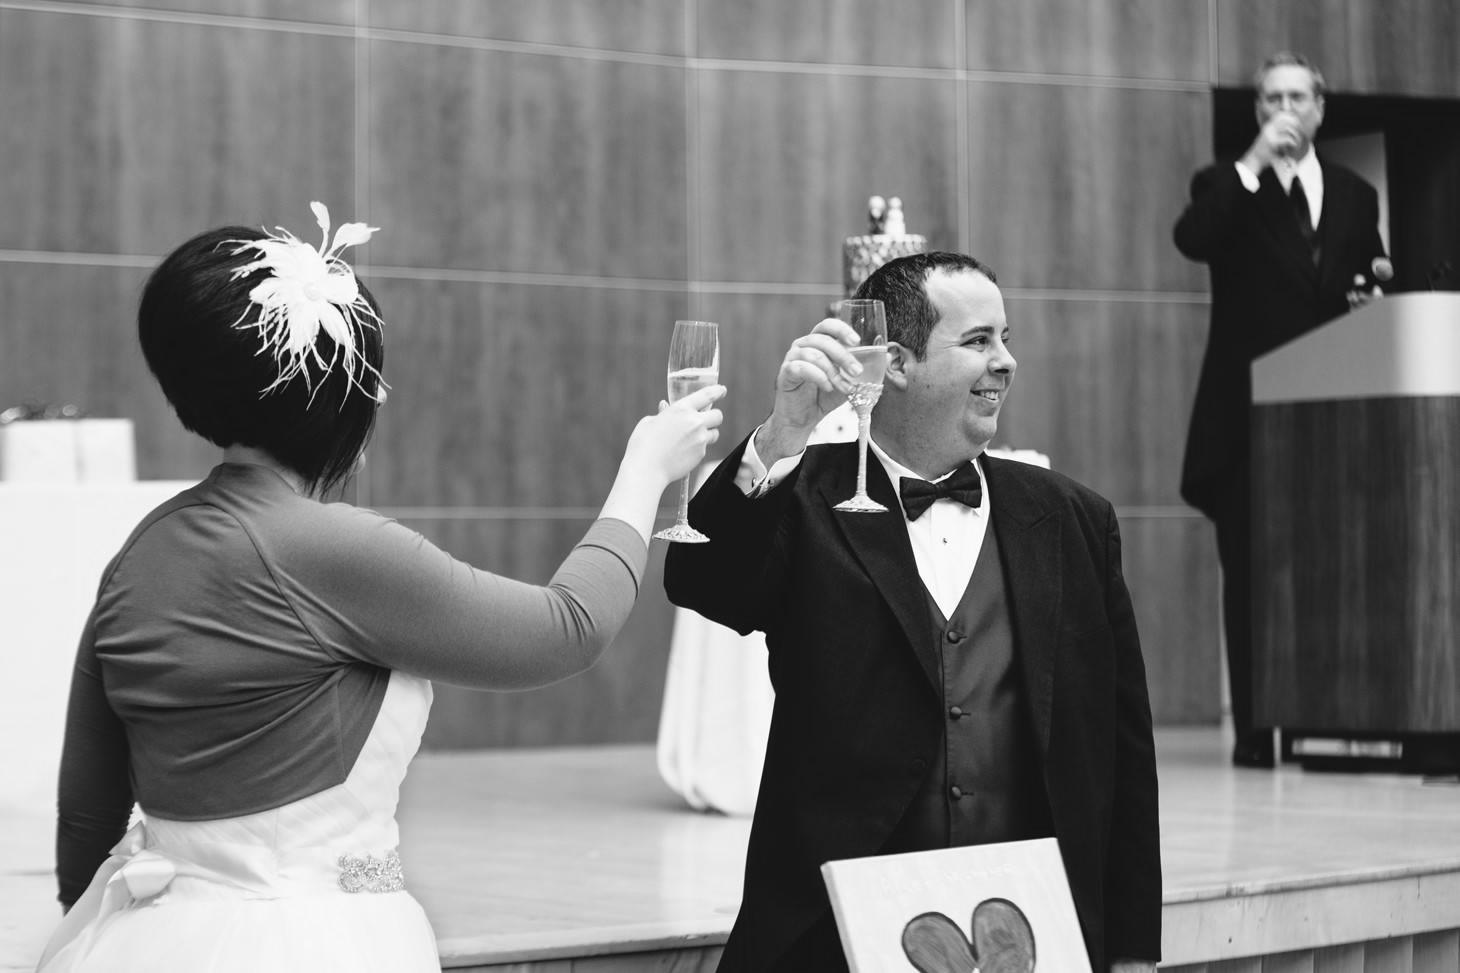 043-nyc-wedding-photographer-smitten-chickens-nj-montclair-art-museum.jpg